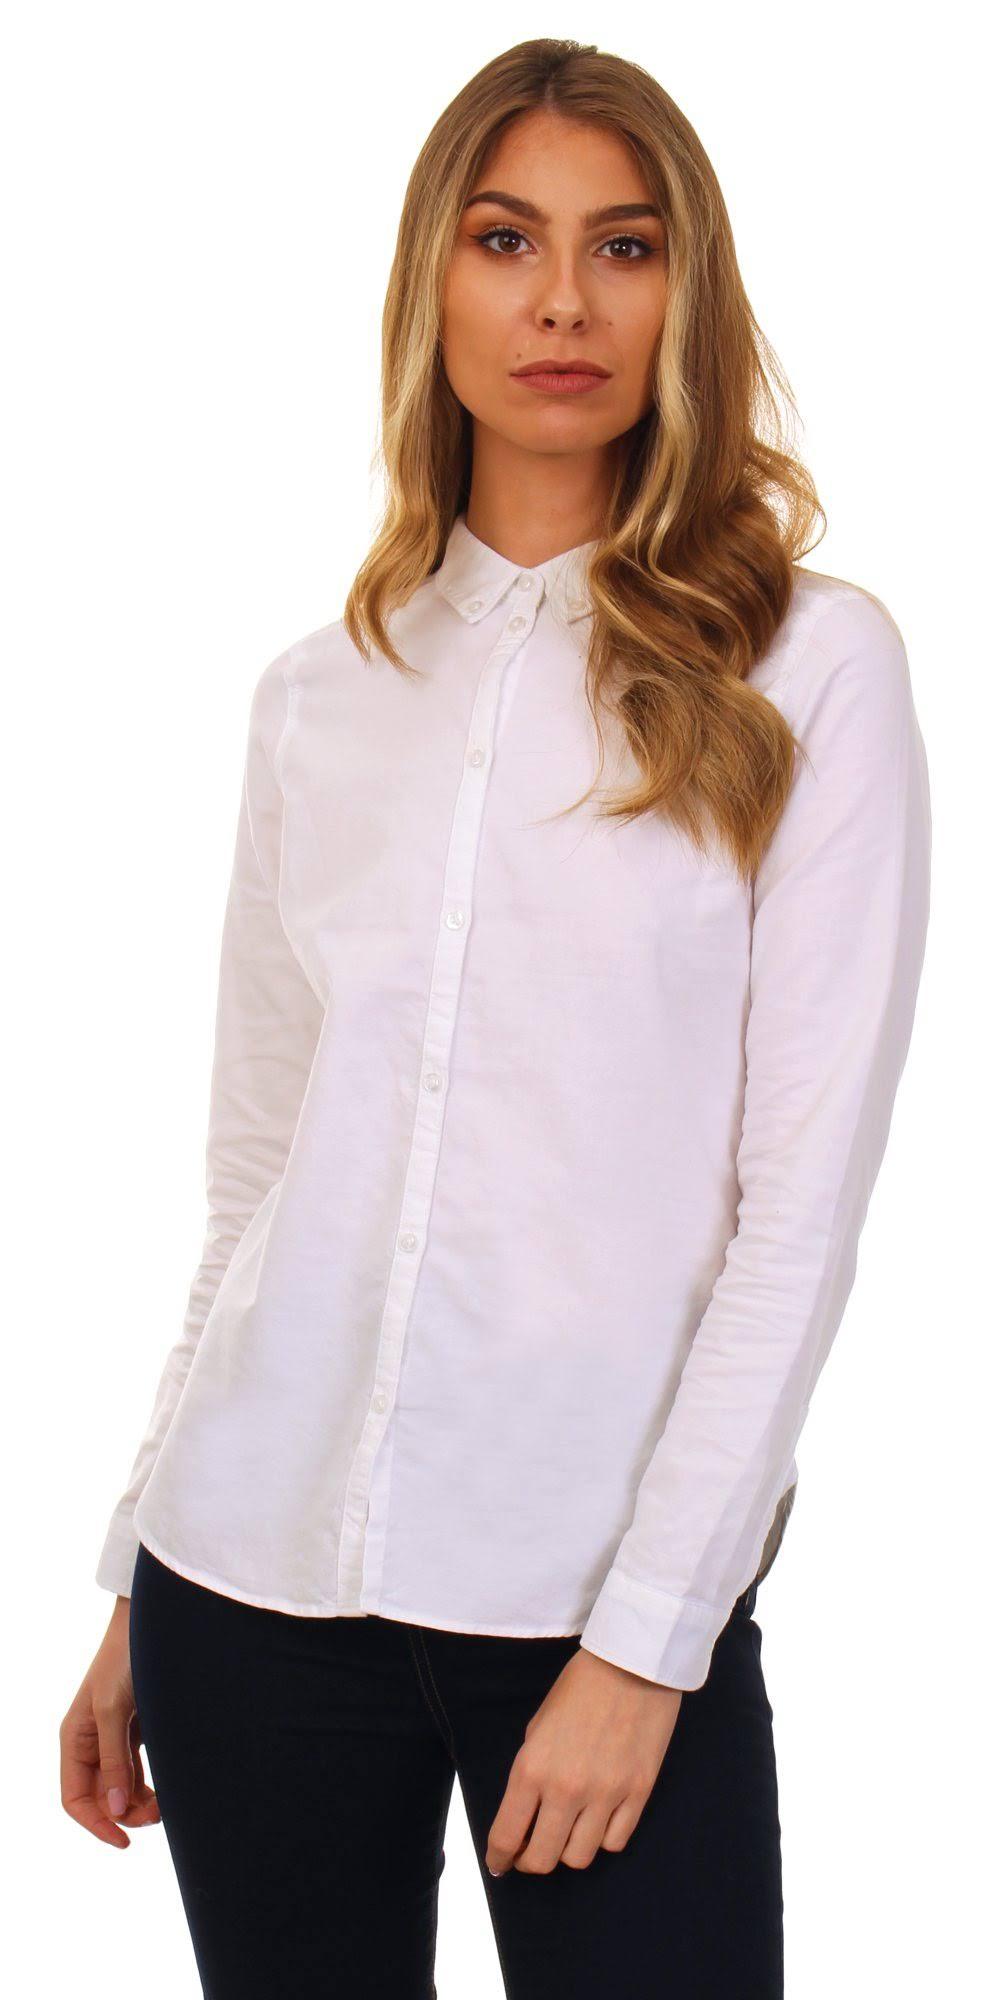 Vero Moda A Blanca Camisa Medida Nieves TxvtnE